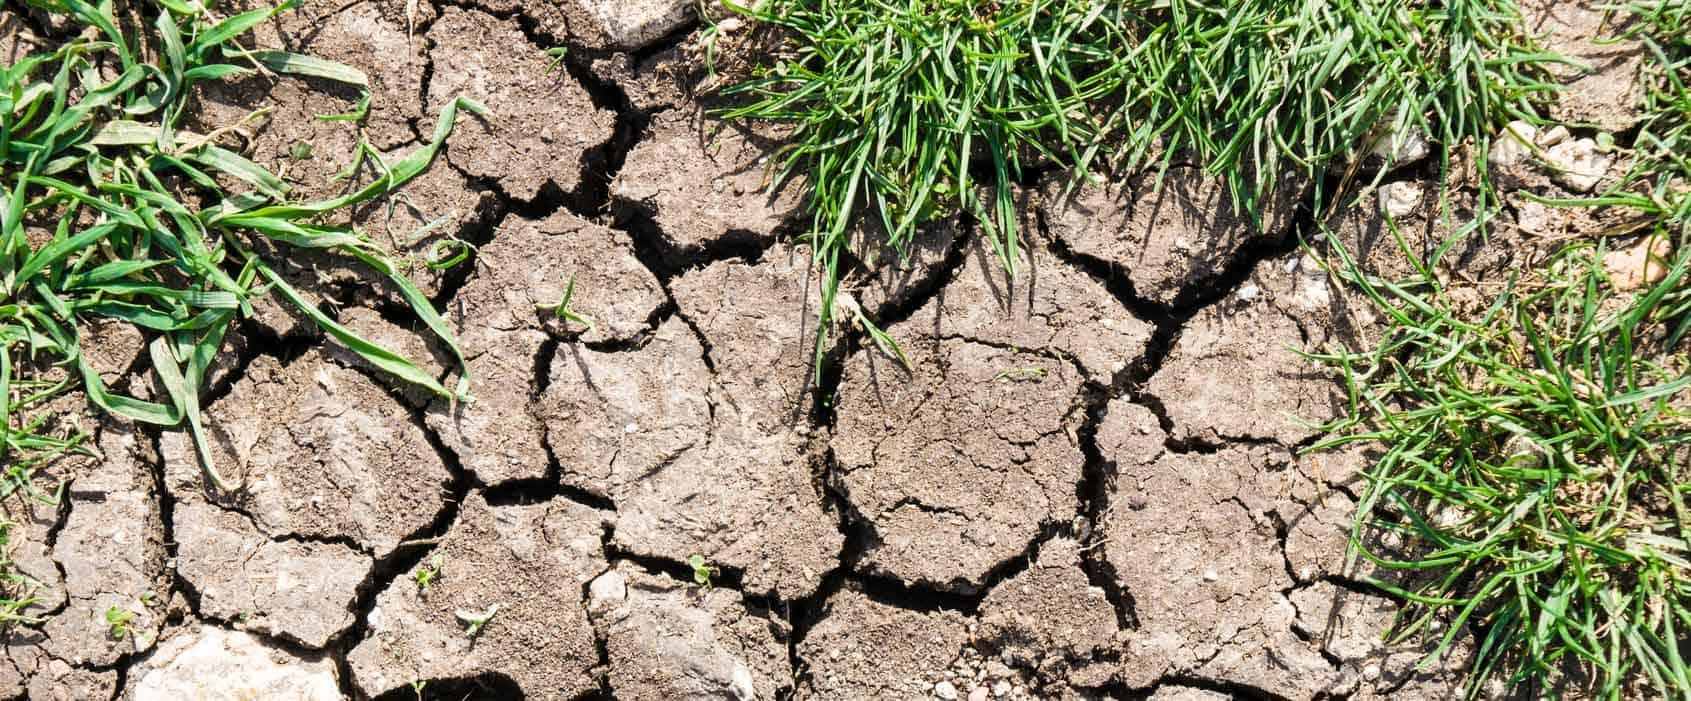 expansive soil